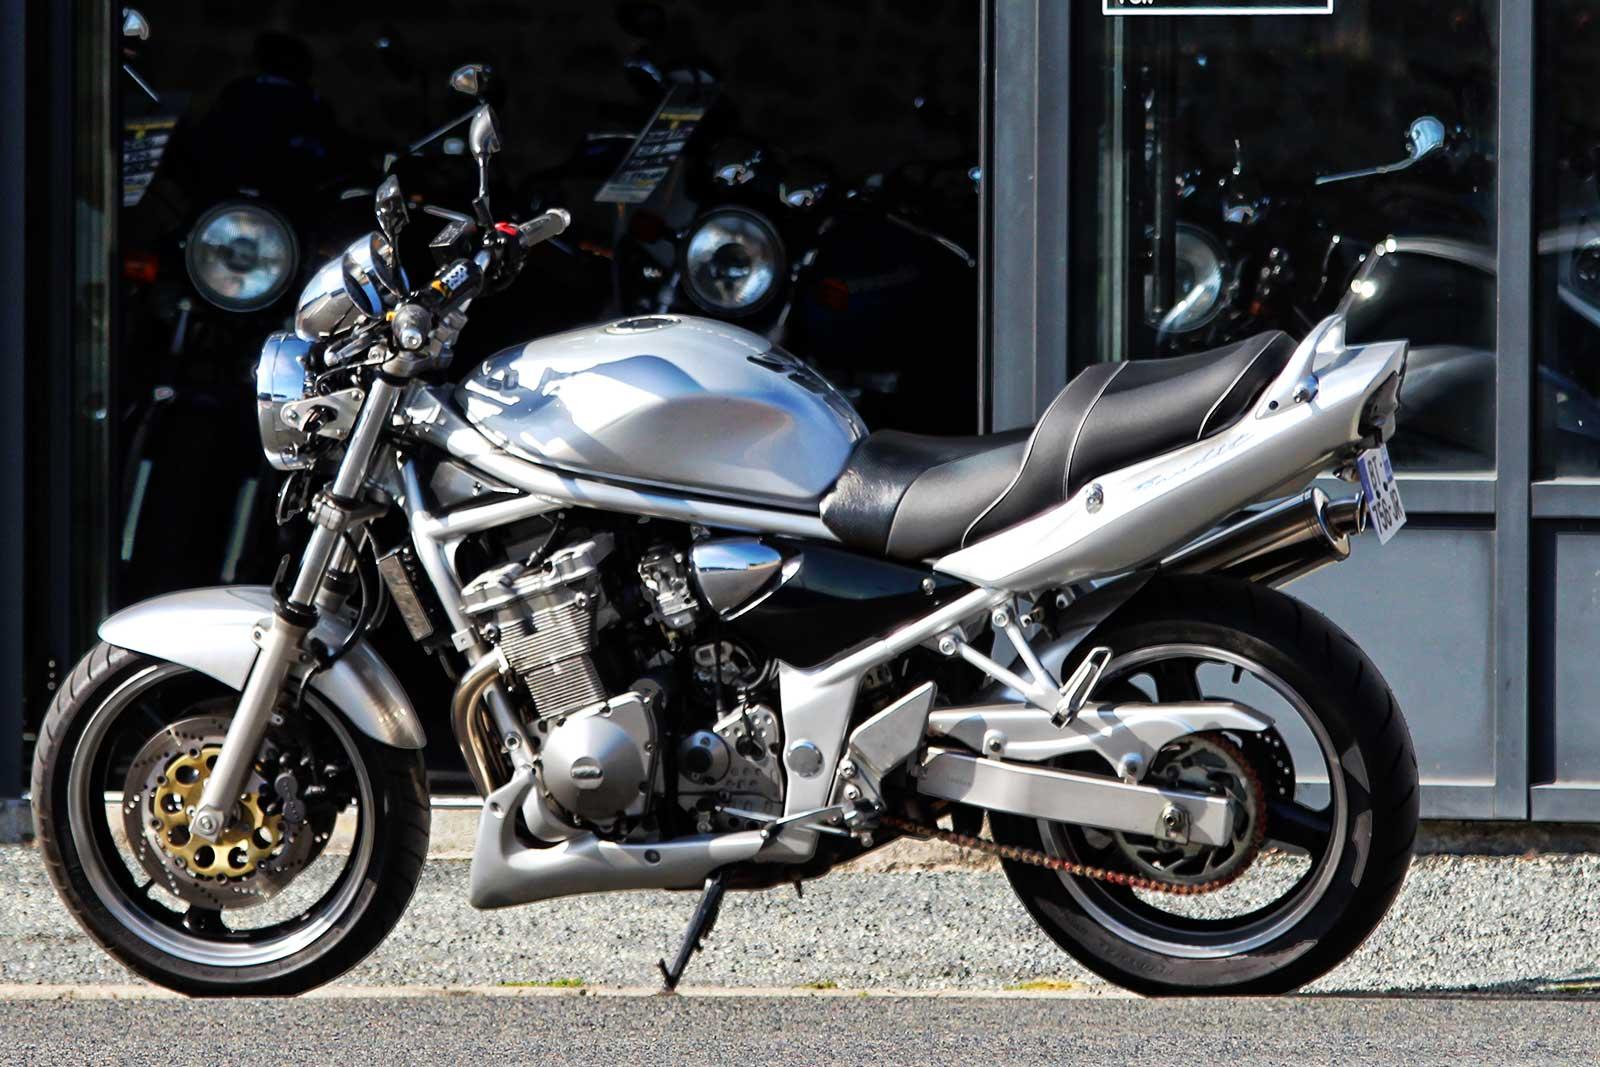 Обзор модели Suzuki Bandit (Сузуки Бандит) 600 (GSF) и его характеристик